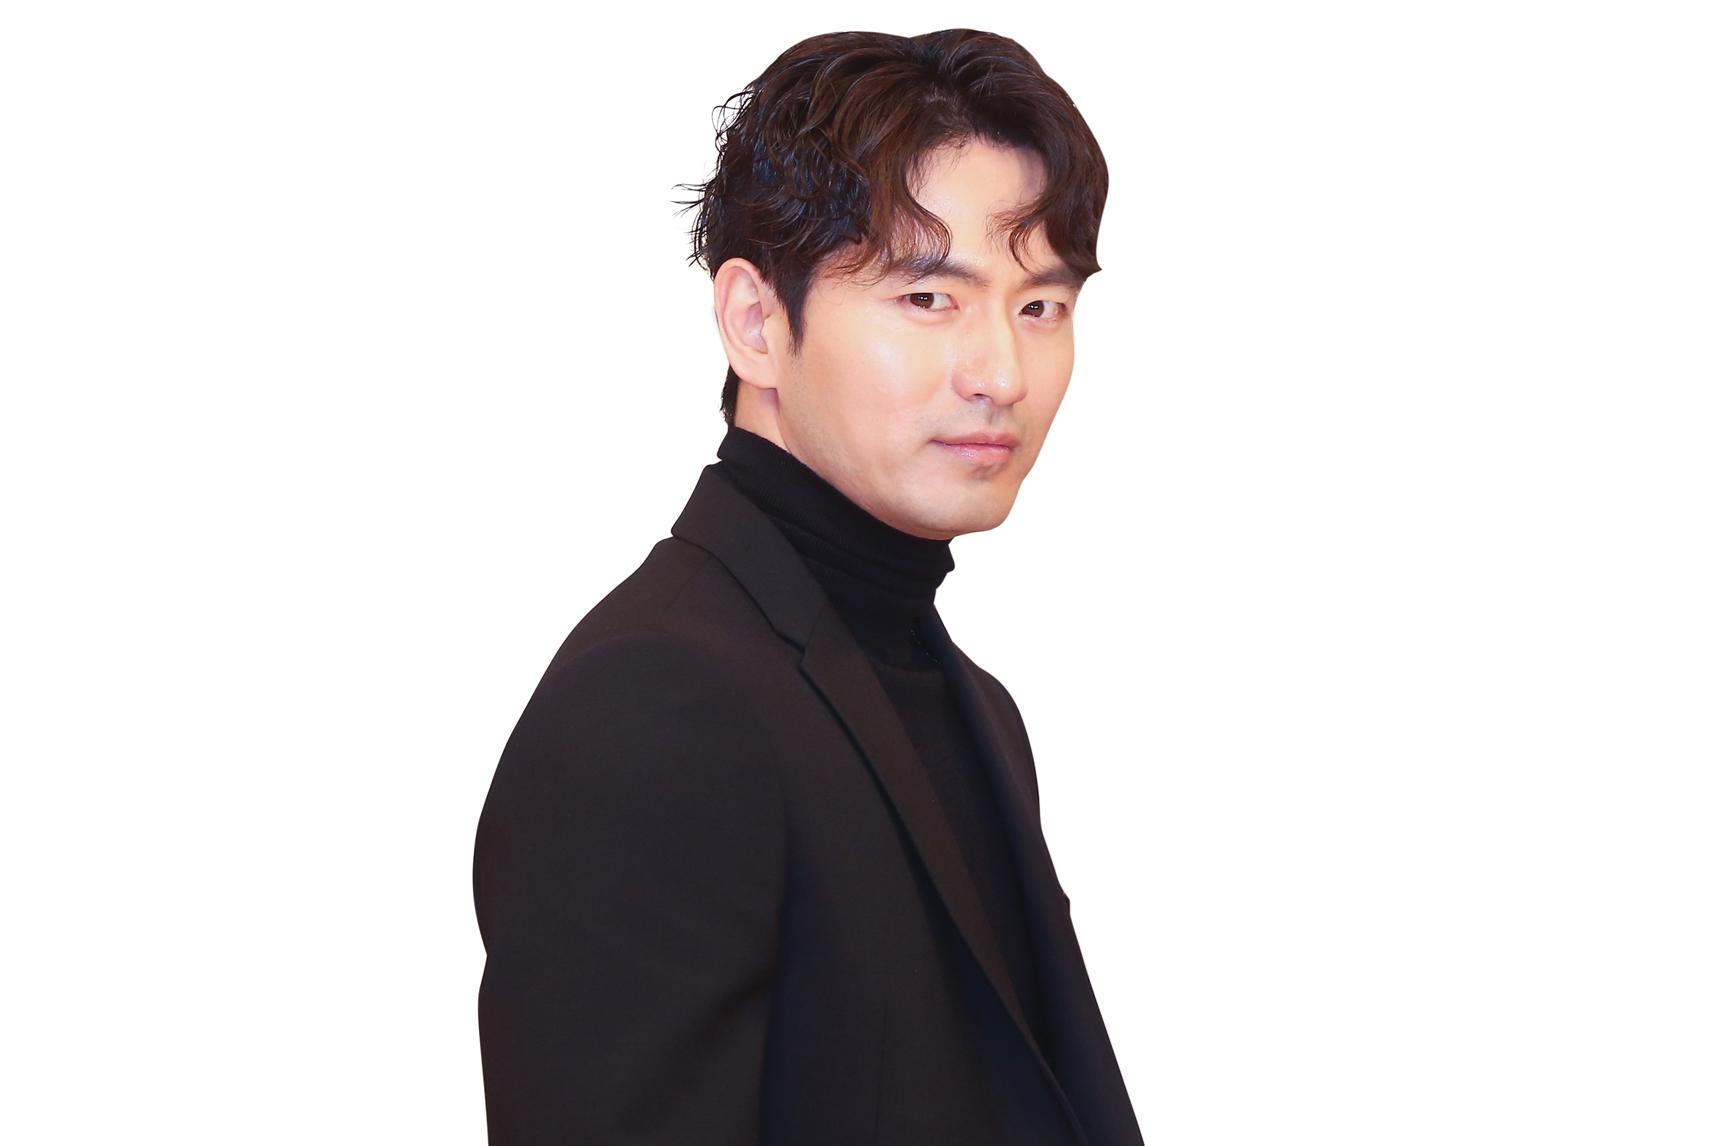 South Korean actor Lee Jin-wook. Image:TOP Photo Corporation